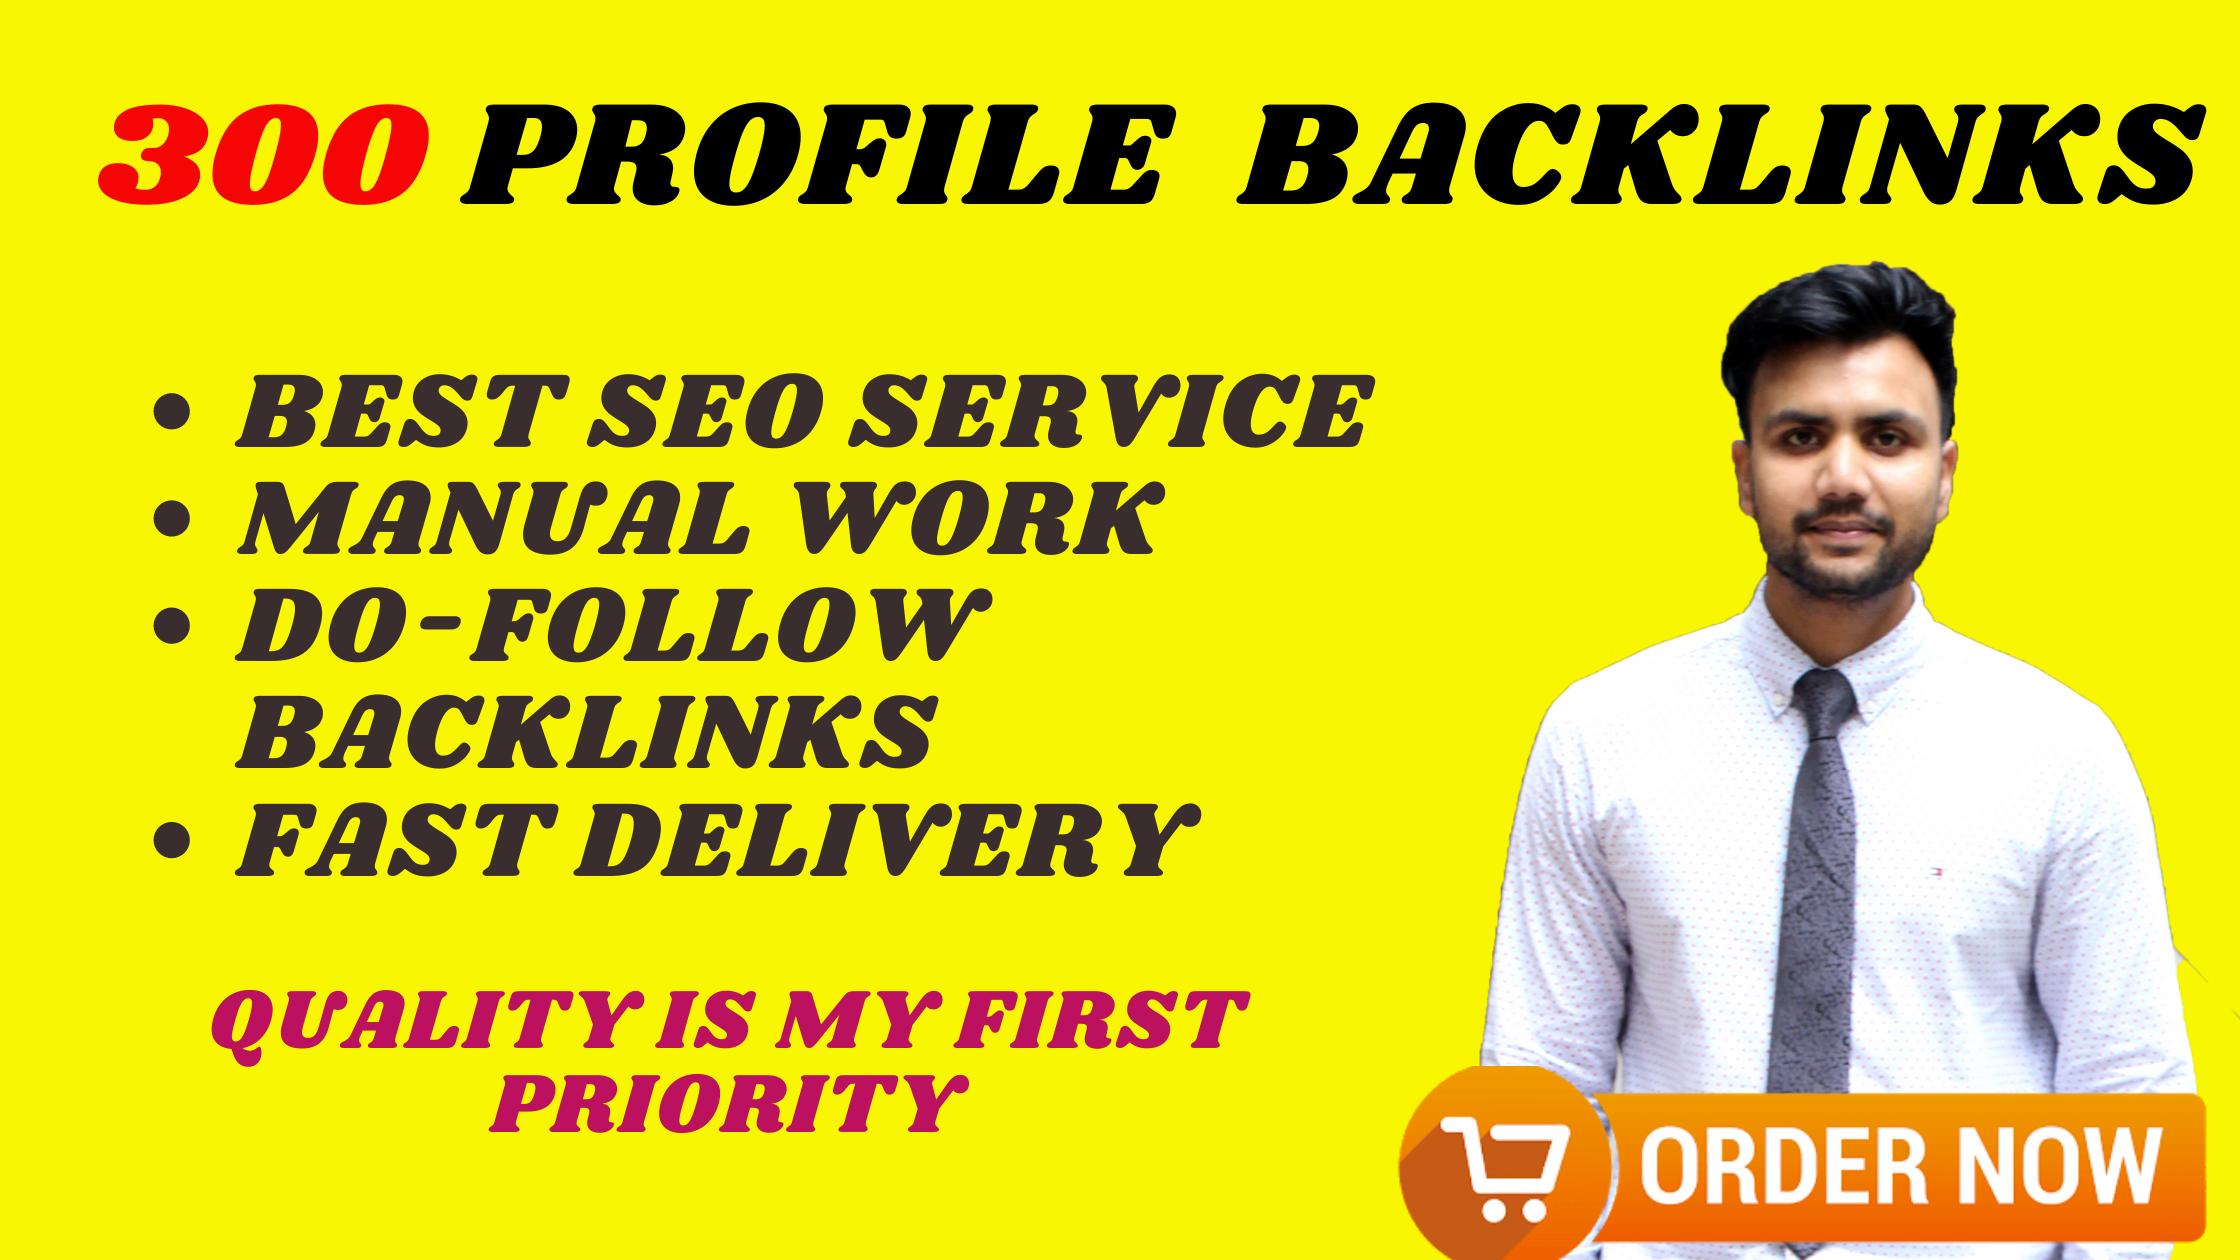 I Will Do Manually 300 Unique Profile Backlinks